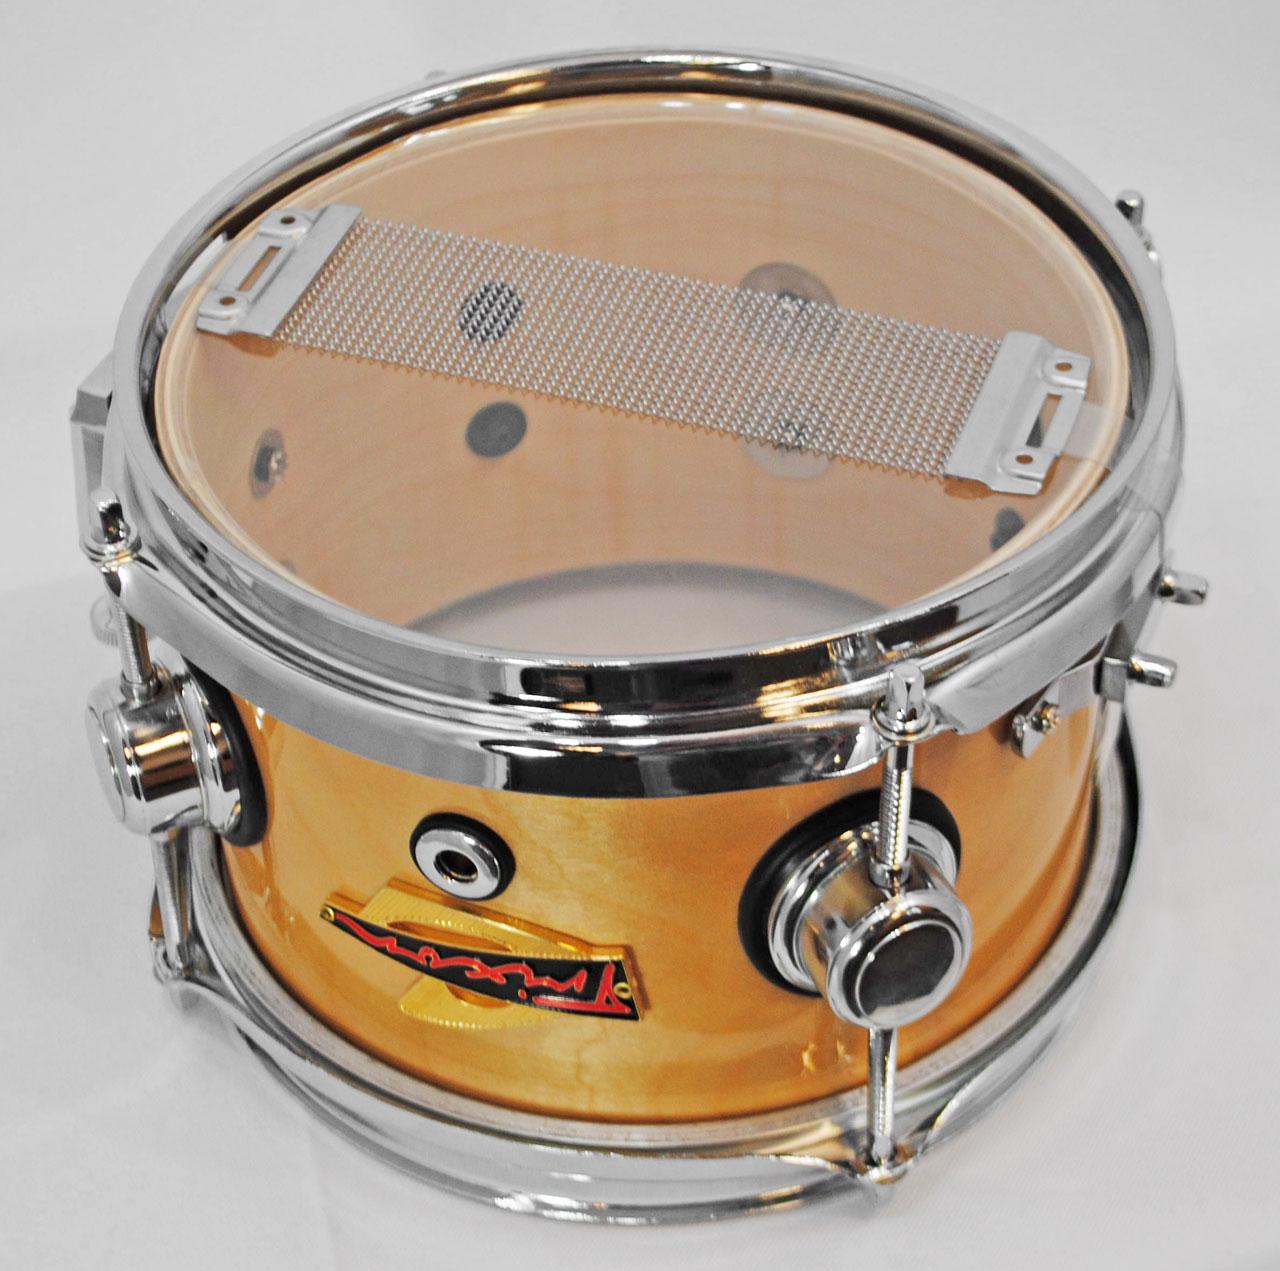 Trixon Elite Popcorn Snare Drum - Natural